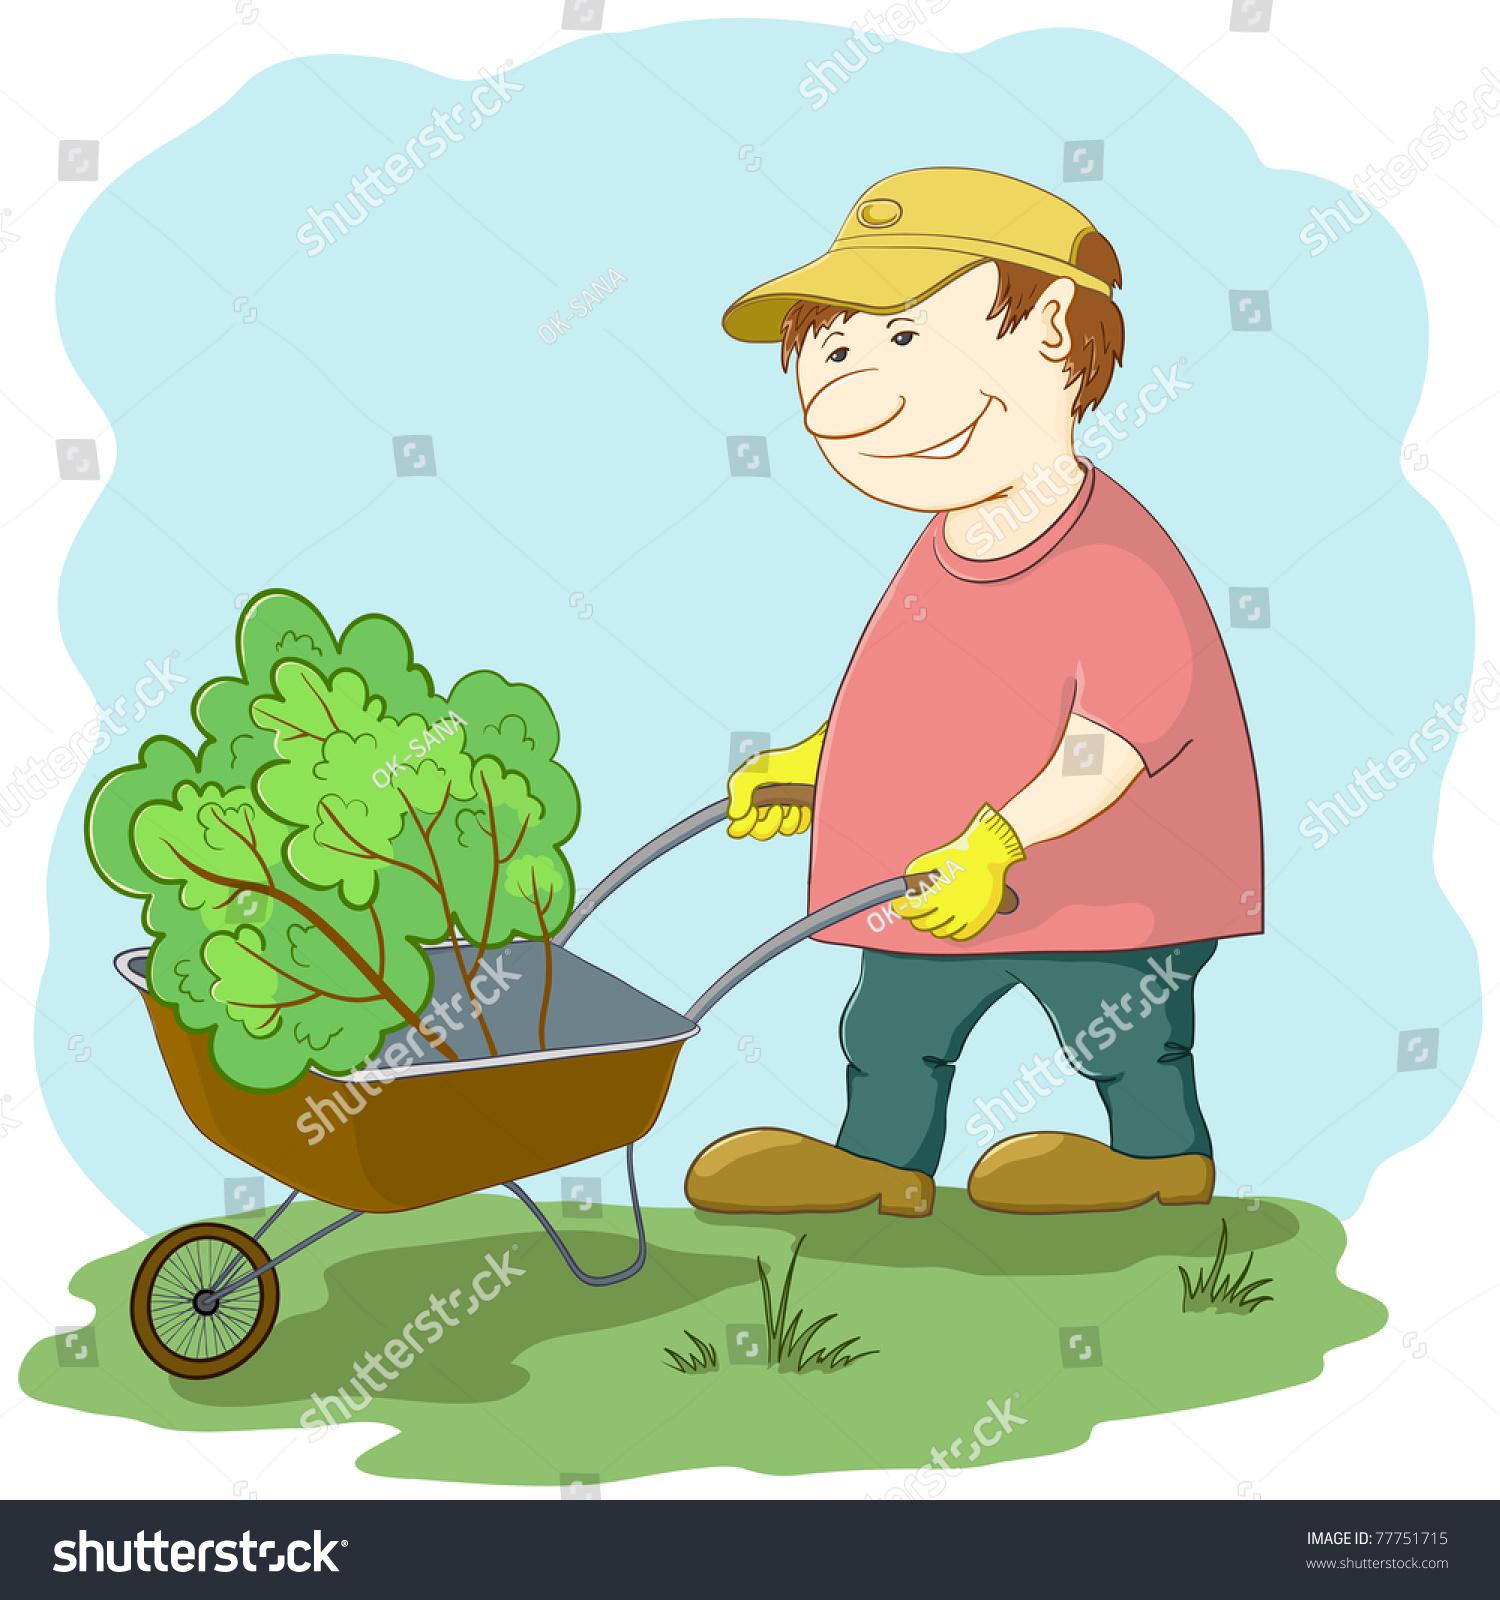 stock vector man gardener works in a garden rolls a wheelbarrow with a plant